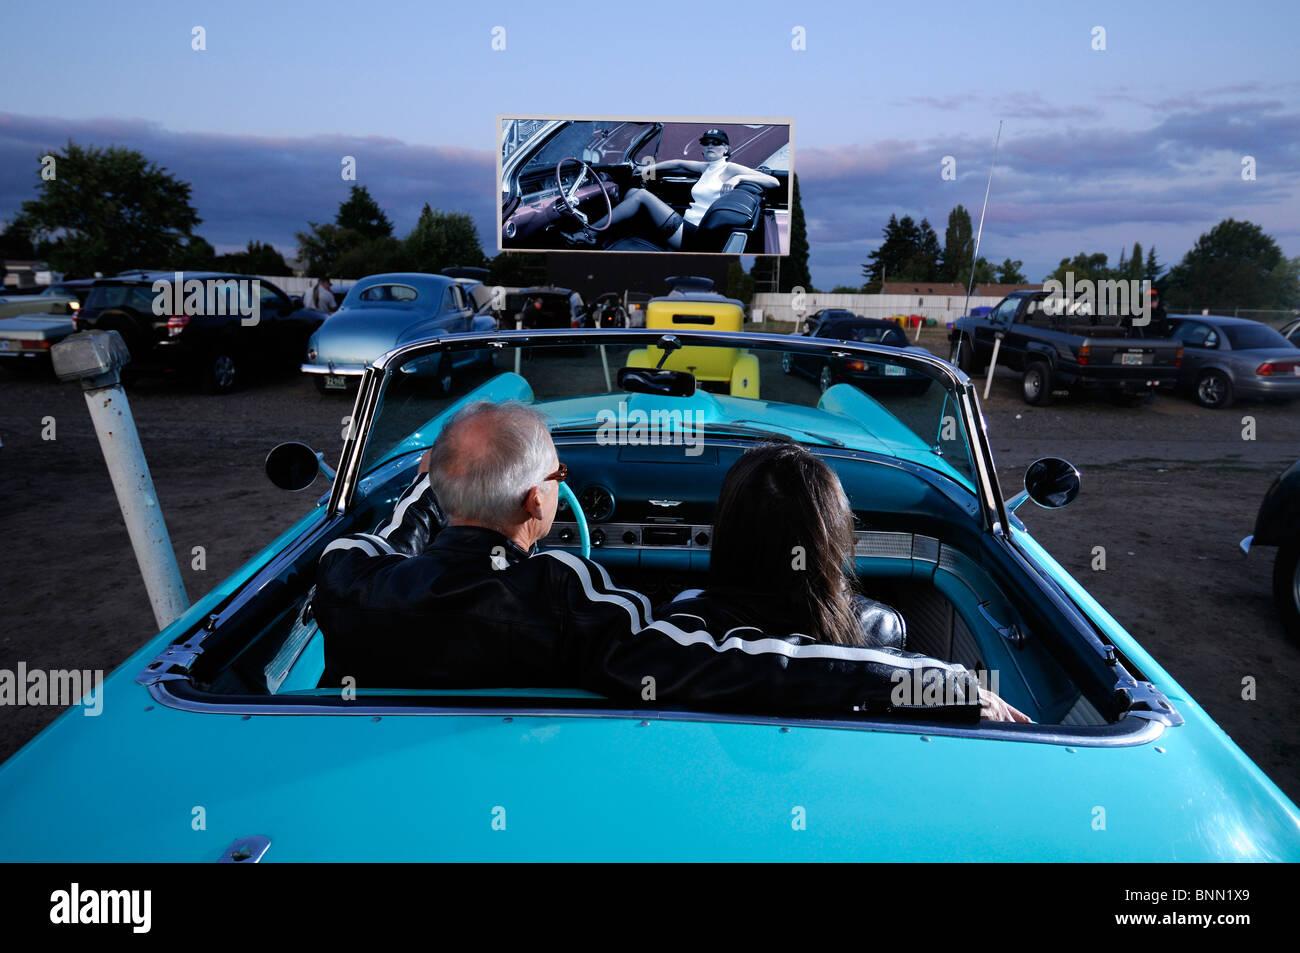 man woman couple classic car 1955 T-Bird Motor Vu Drive In Dallas Oregon USA cinema parking, - Stock Image